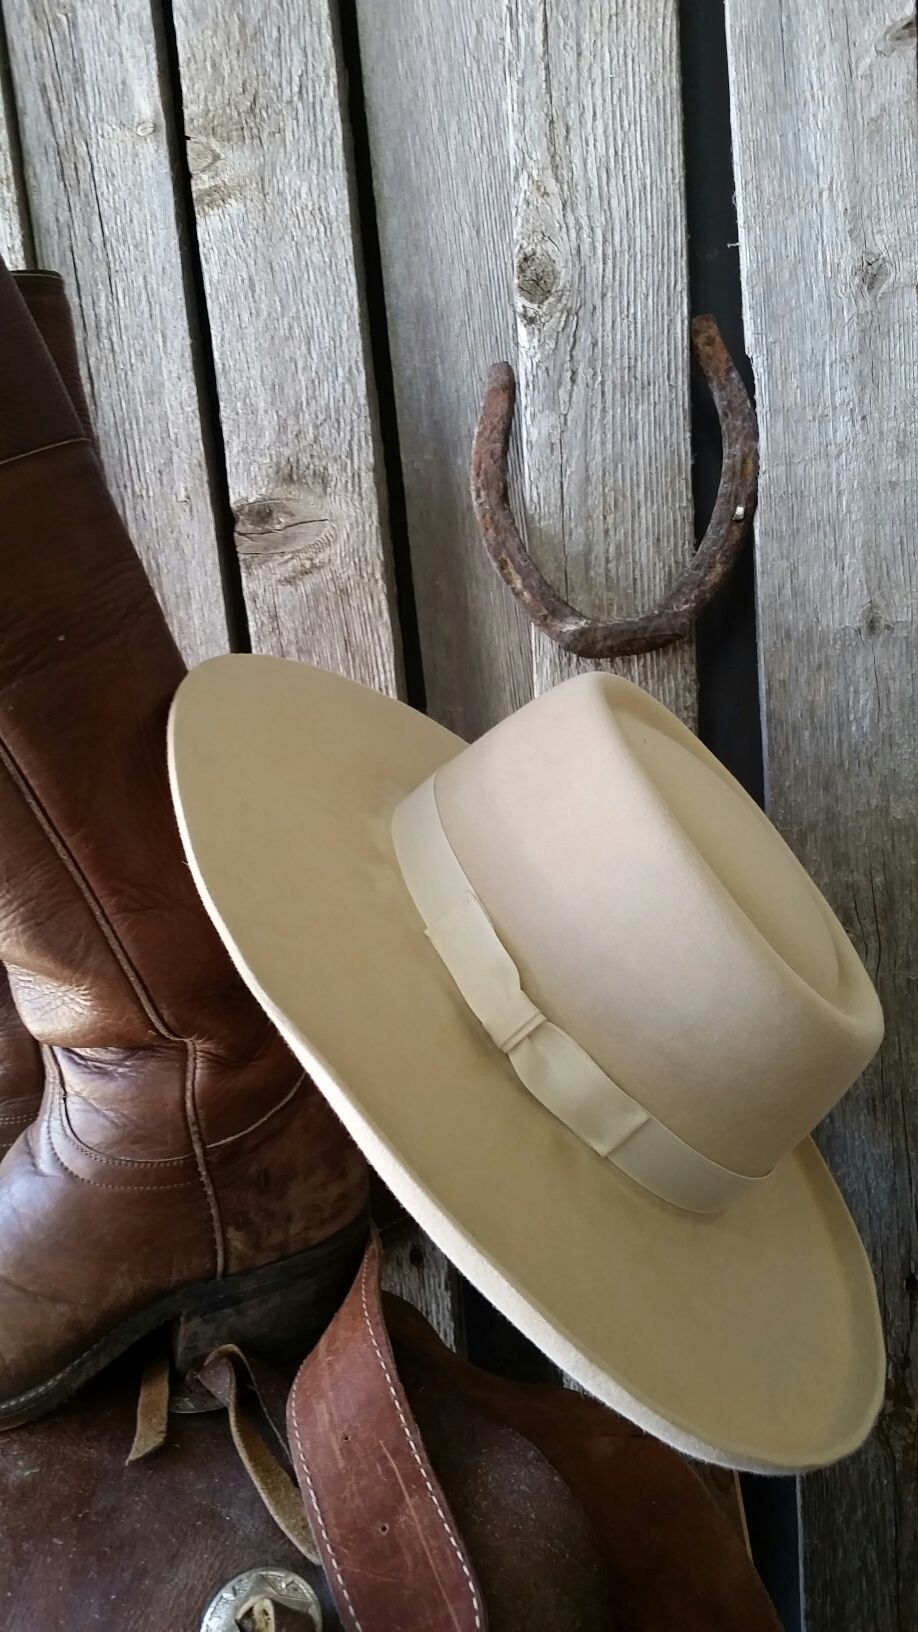 ba4a5e2729c Bucks Sombrero Cowboy hat or you could call  it a Vaquero style cowboy hat